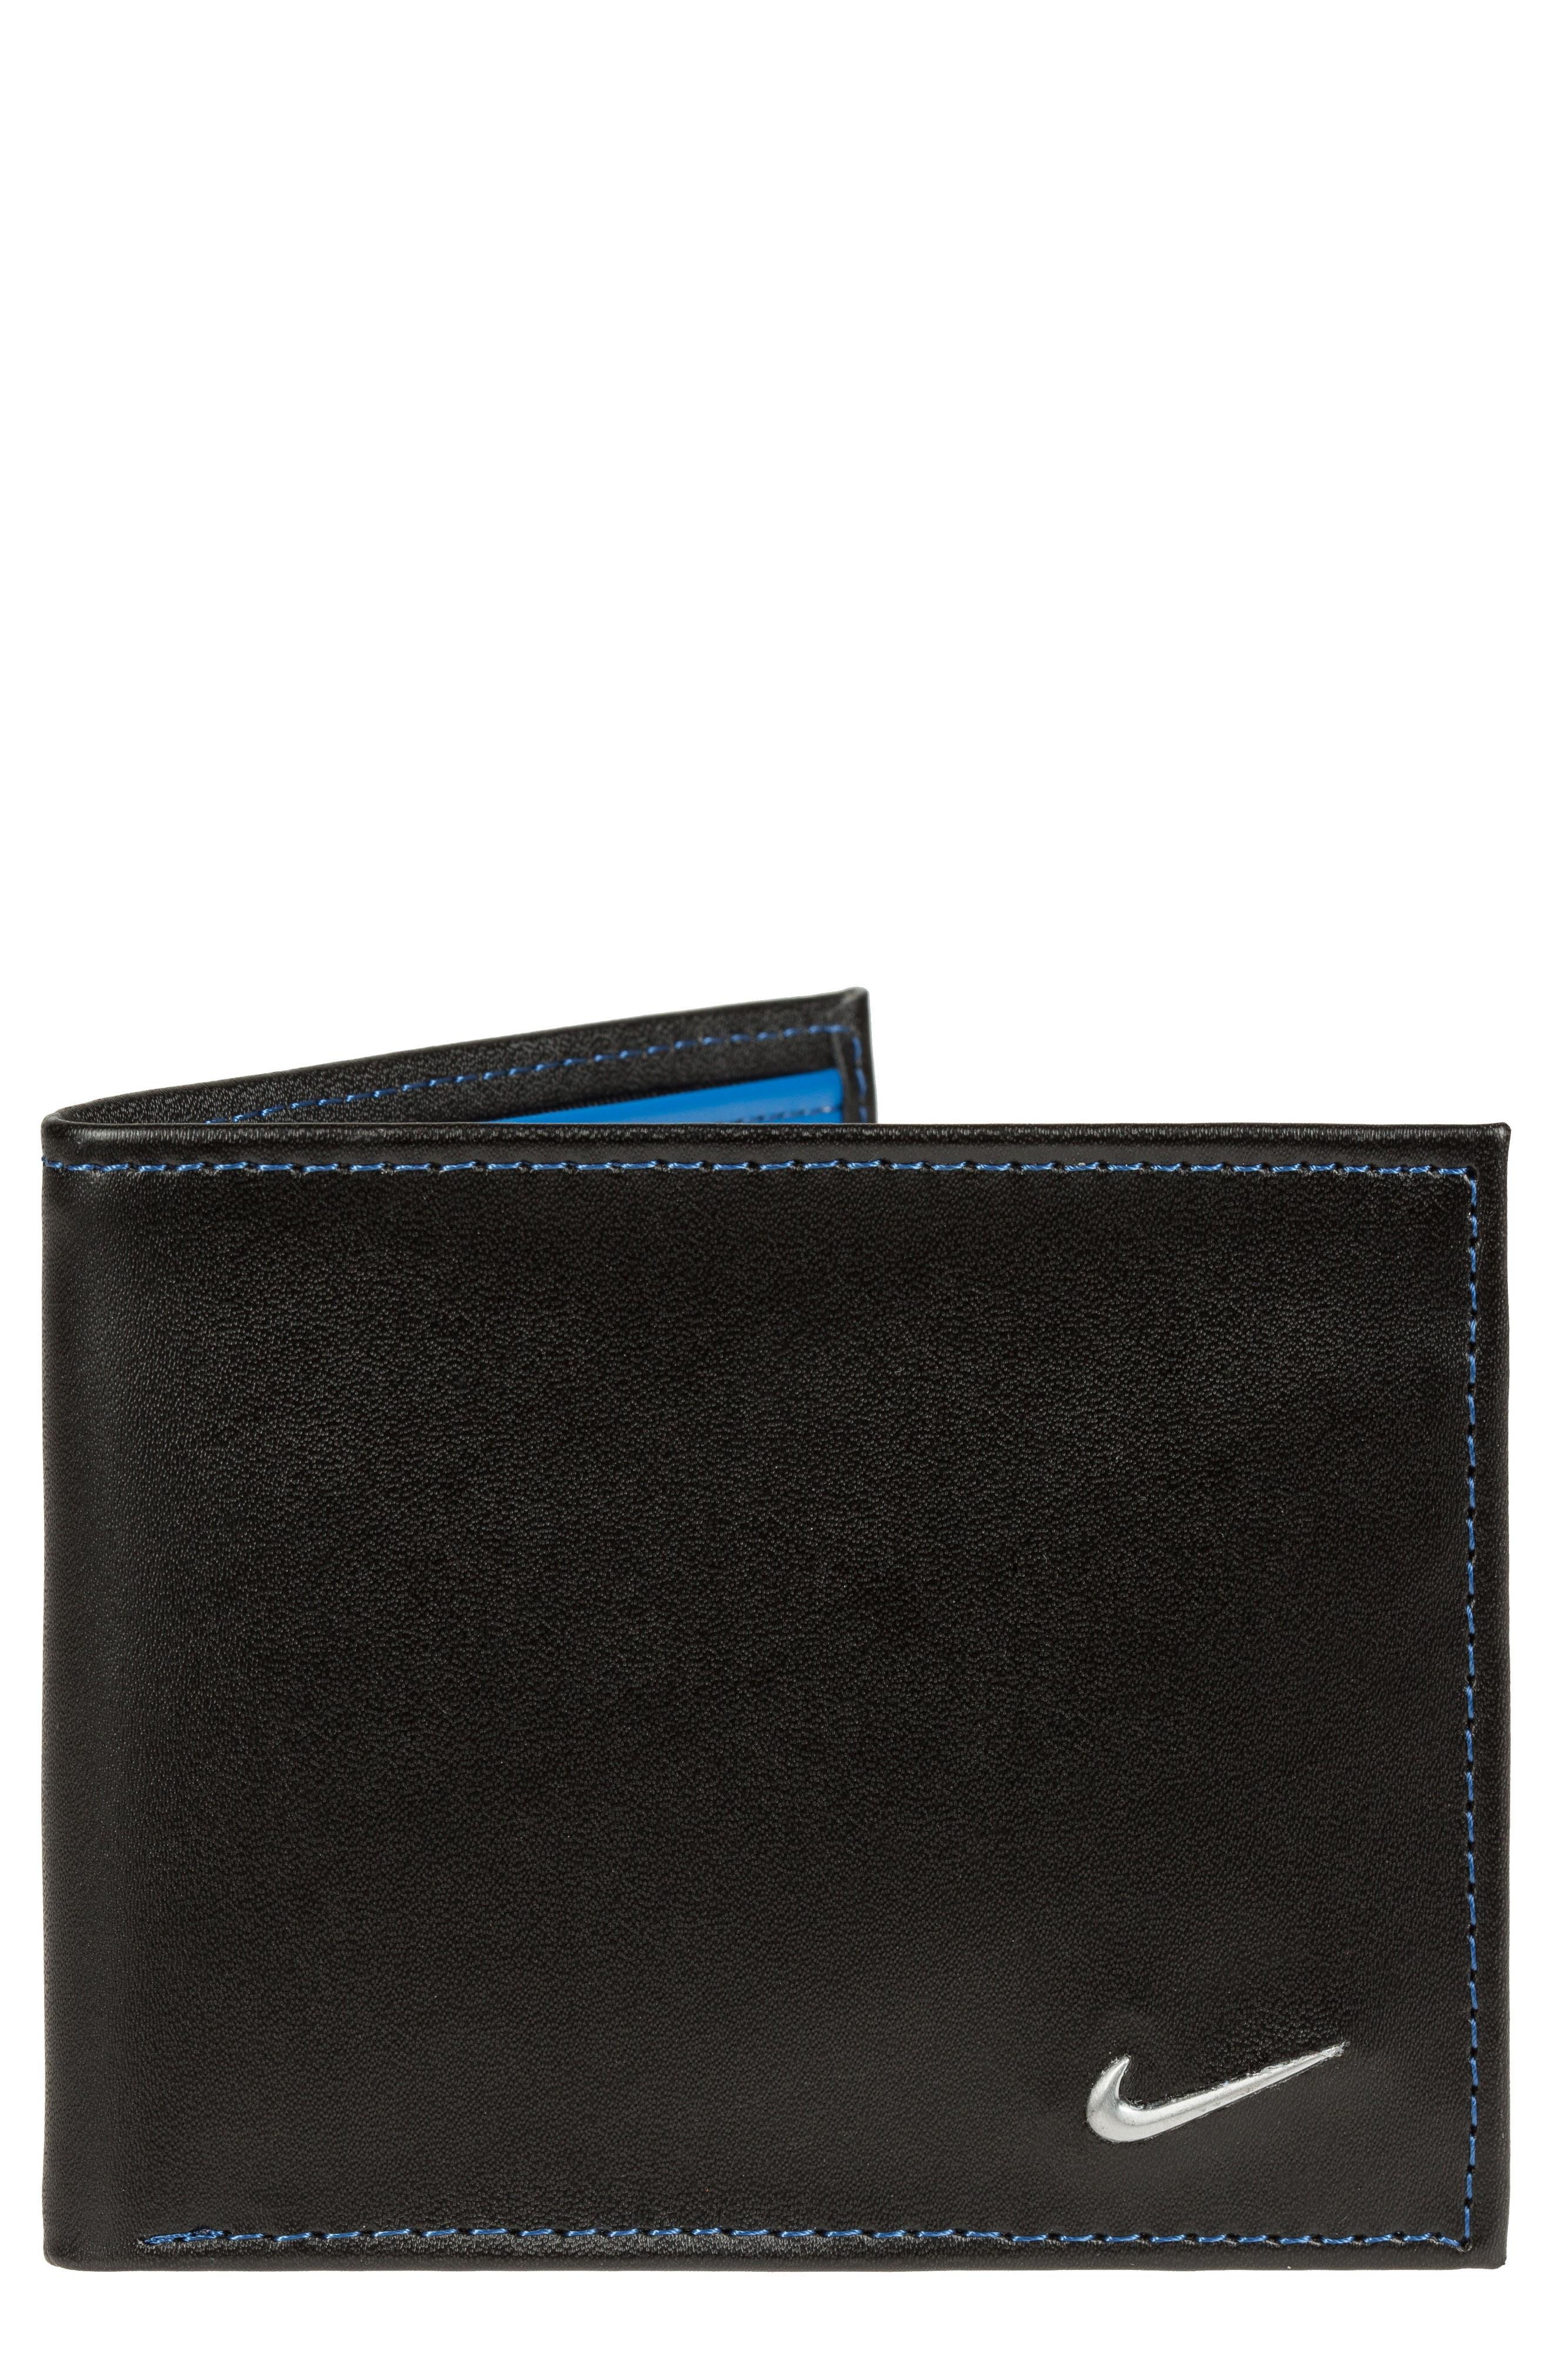 Alternate Image 1 Selected - Nike Modern Leather Wallet